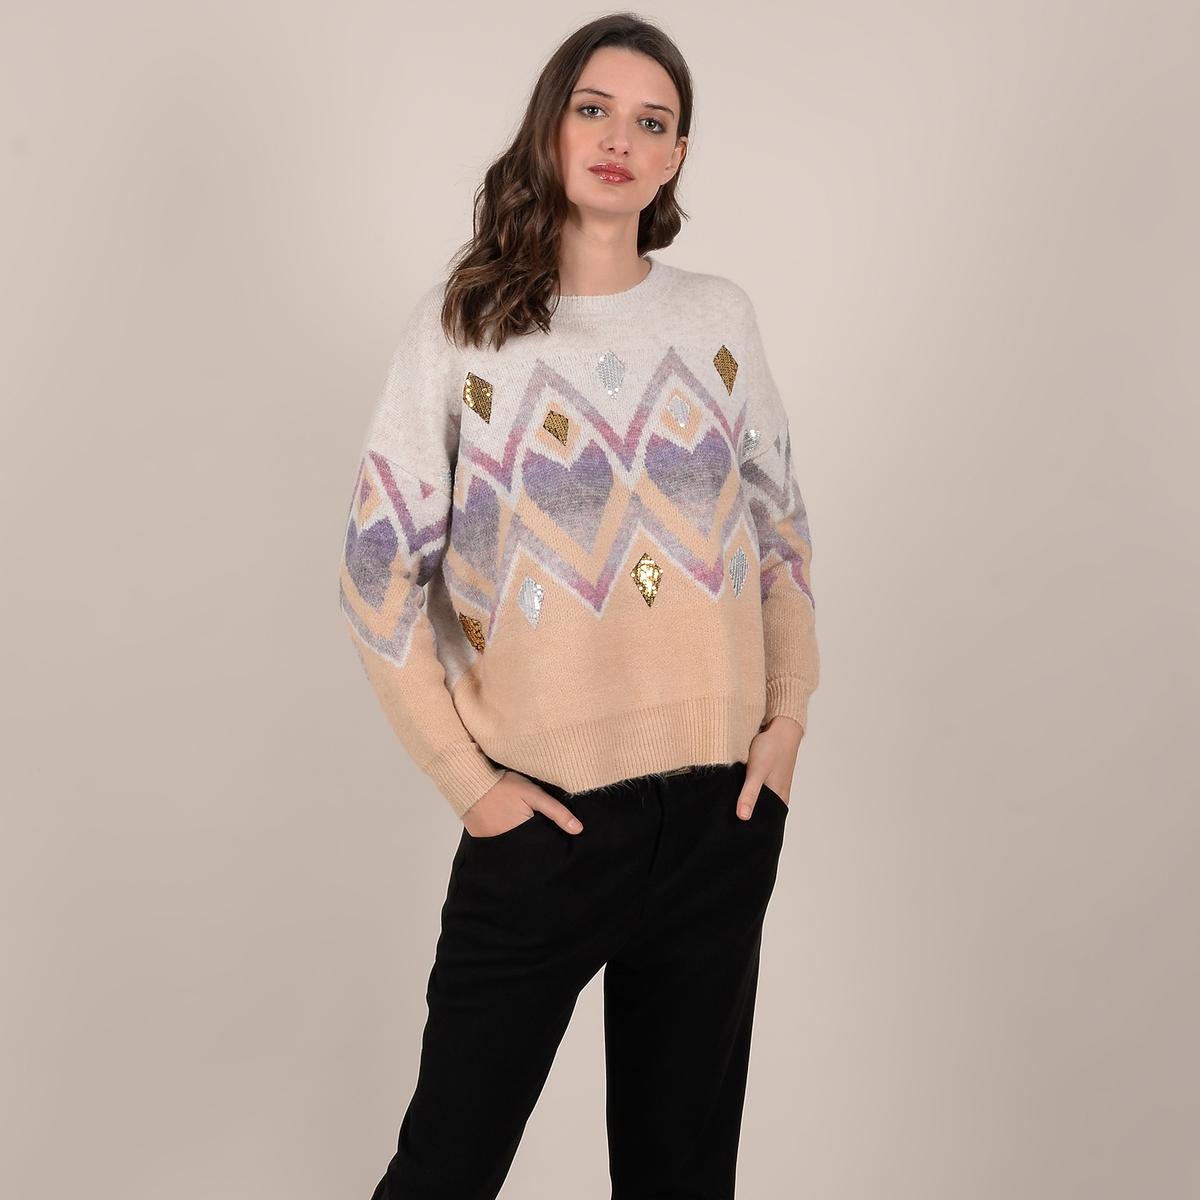 Пуловер La Redoute Жаккардовый с блестками XS/S бежевый lbellagiovanna redfushia белый бежевый xs